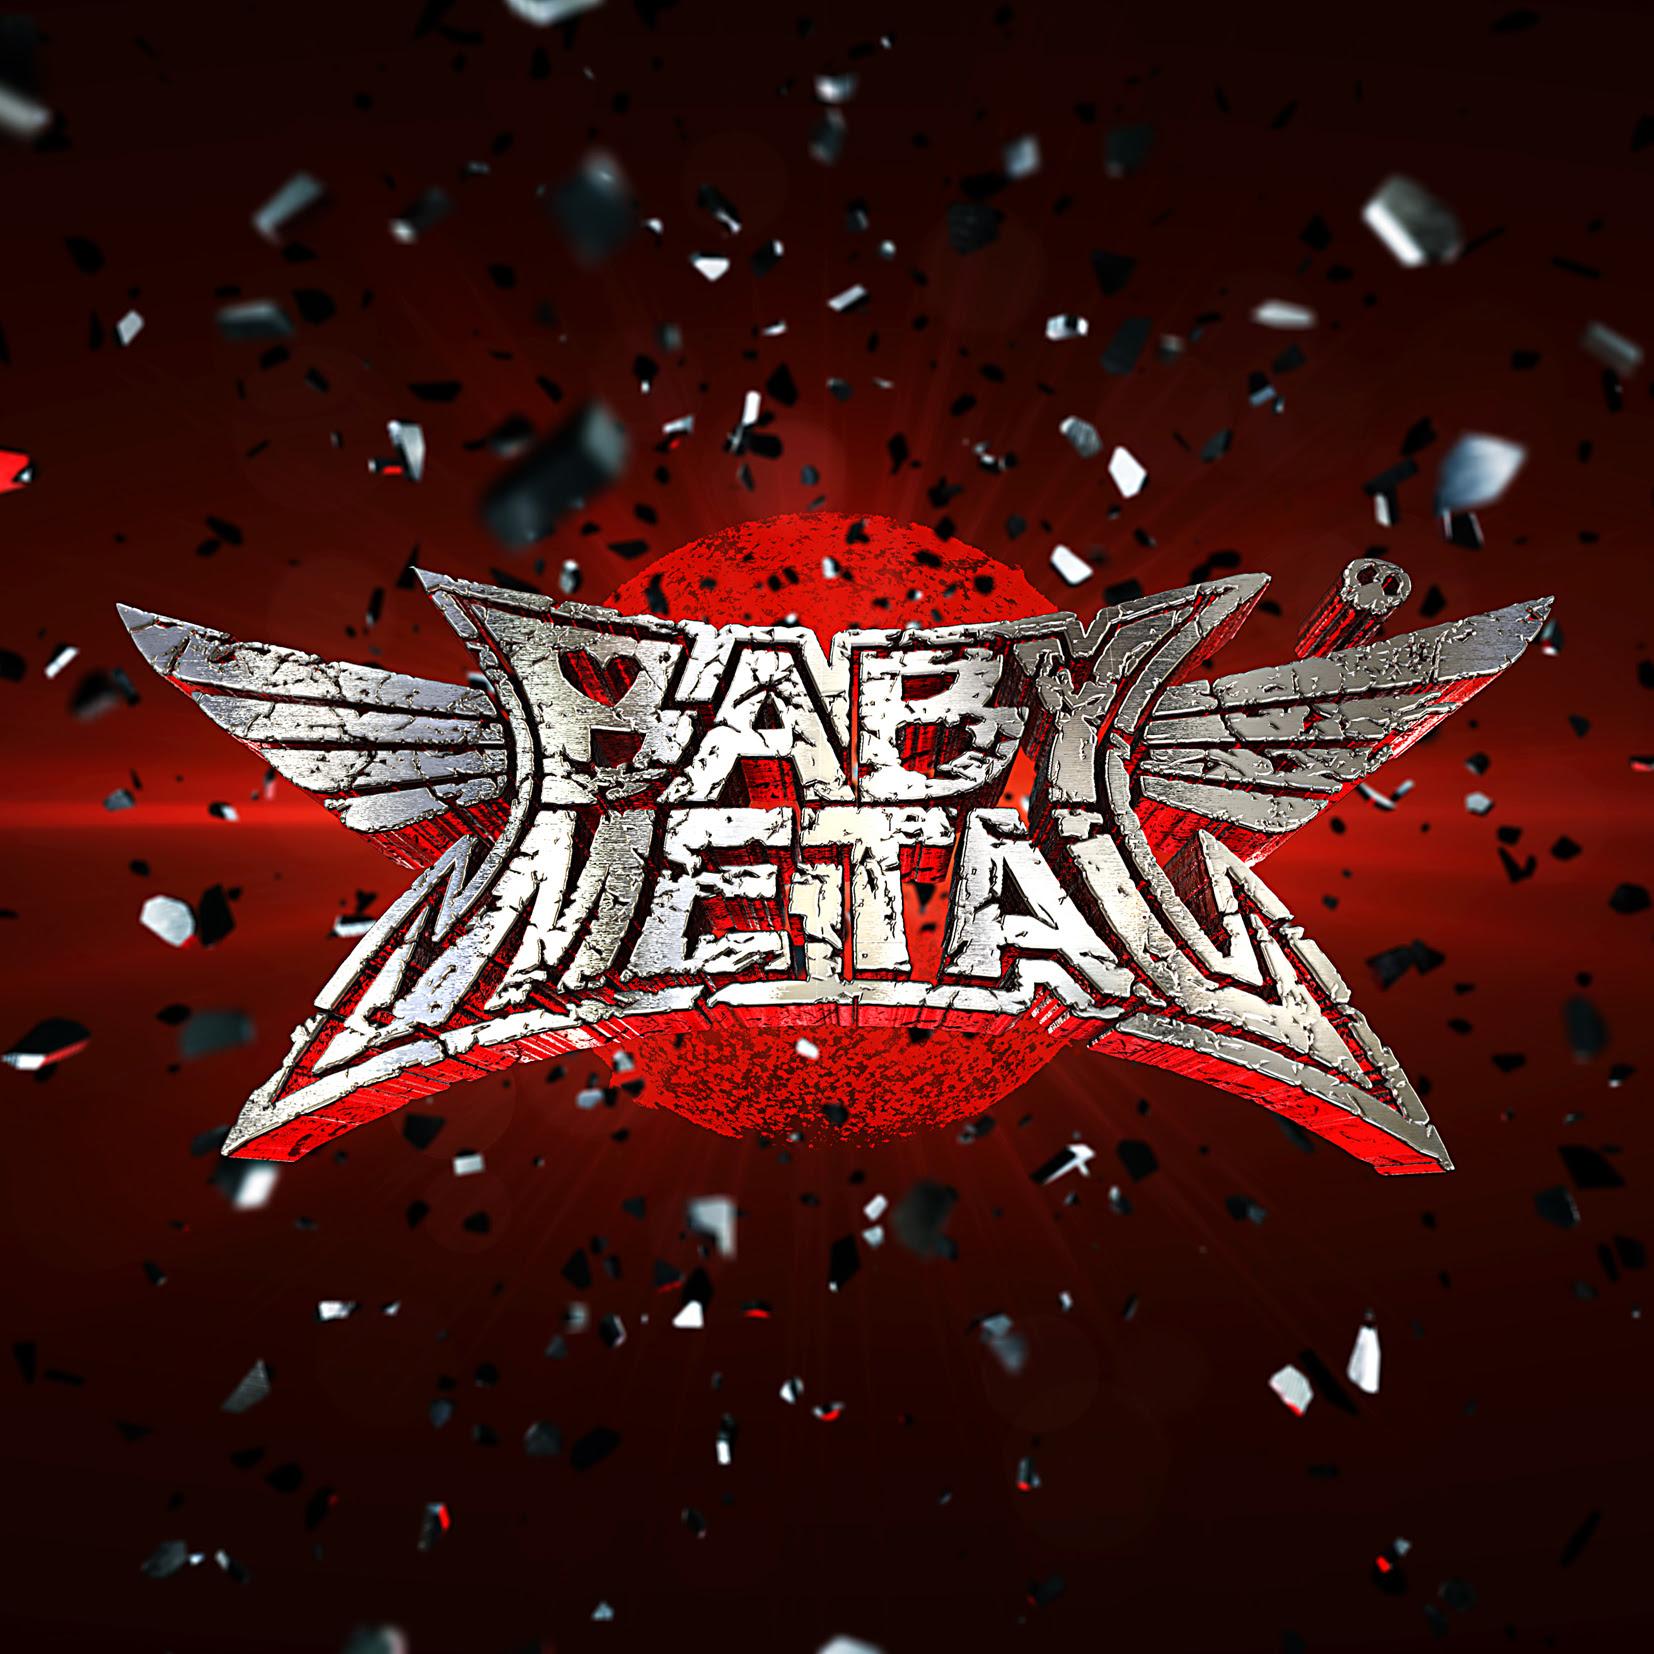 Babymetal ベビーメタル 壁紙 素材画像集 まとめ Naver まとめ